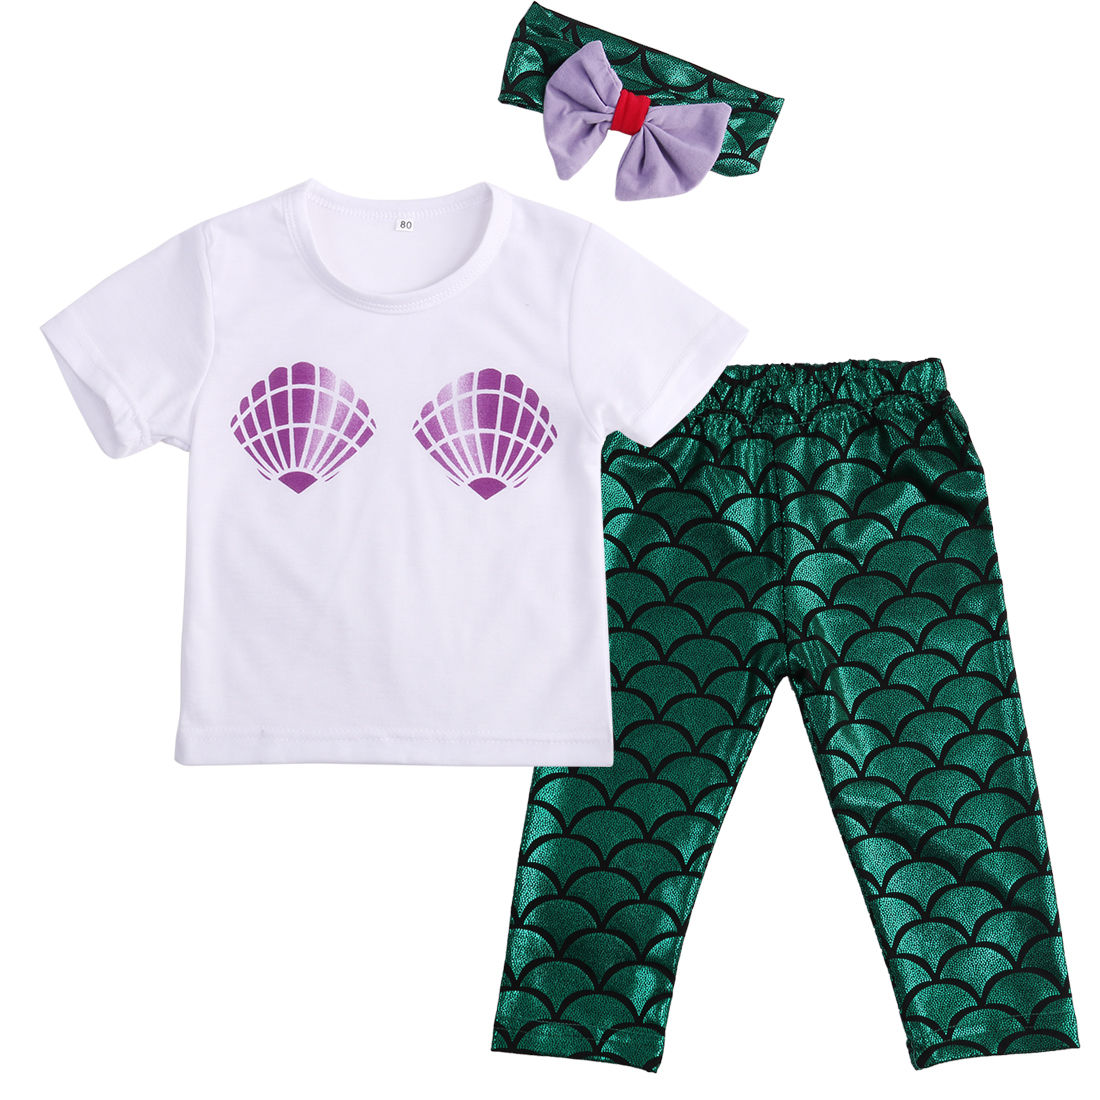 90f77d7fb T-shirt-Mermaid-Leggings-Pants-Headband-Outfits-Set-Baby-Girl-0-24M-Newborn- Baby-Girl-Clothes.jpg